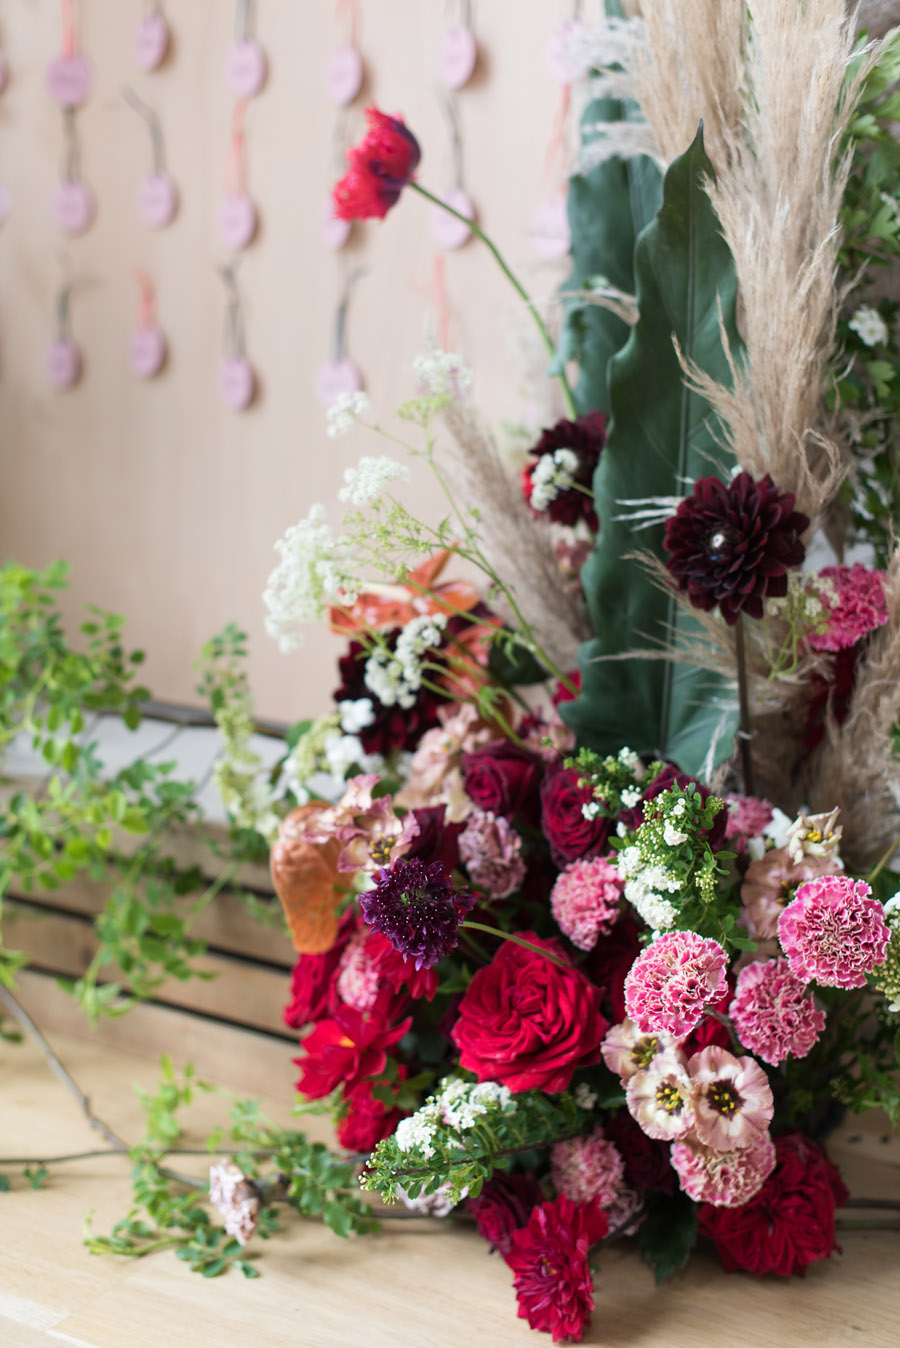 floral wedding ideas at Millbridge Court on English Wedding - photo credit Julie Michaelsen Photography (38)